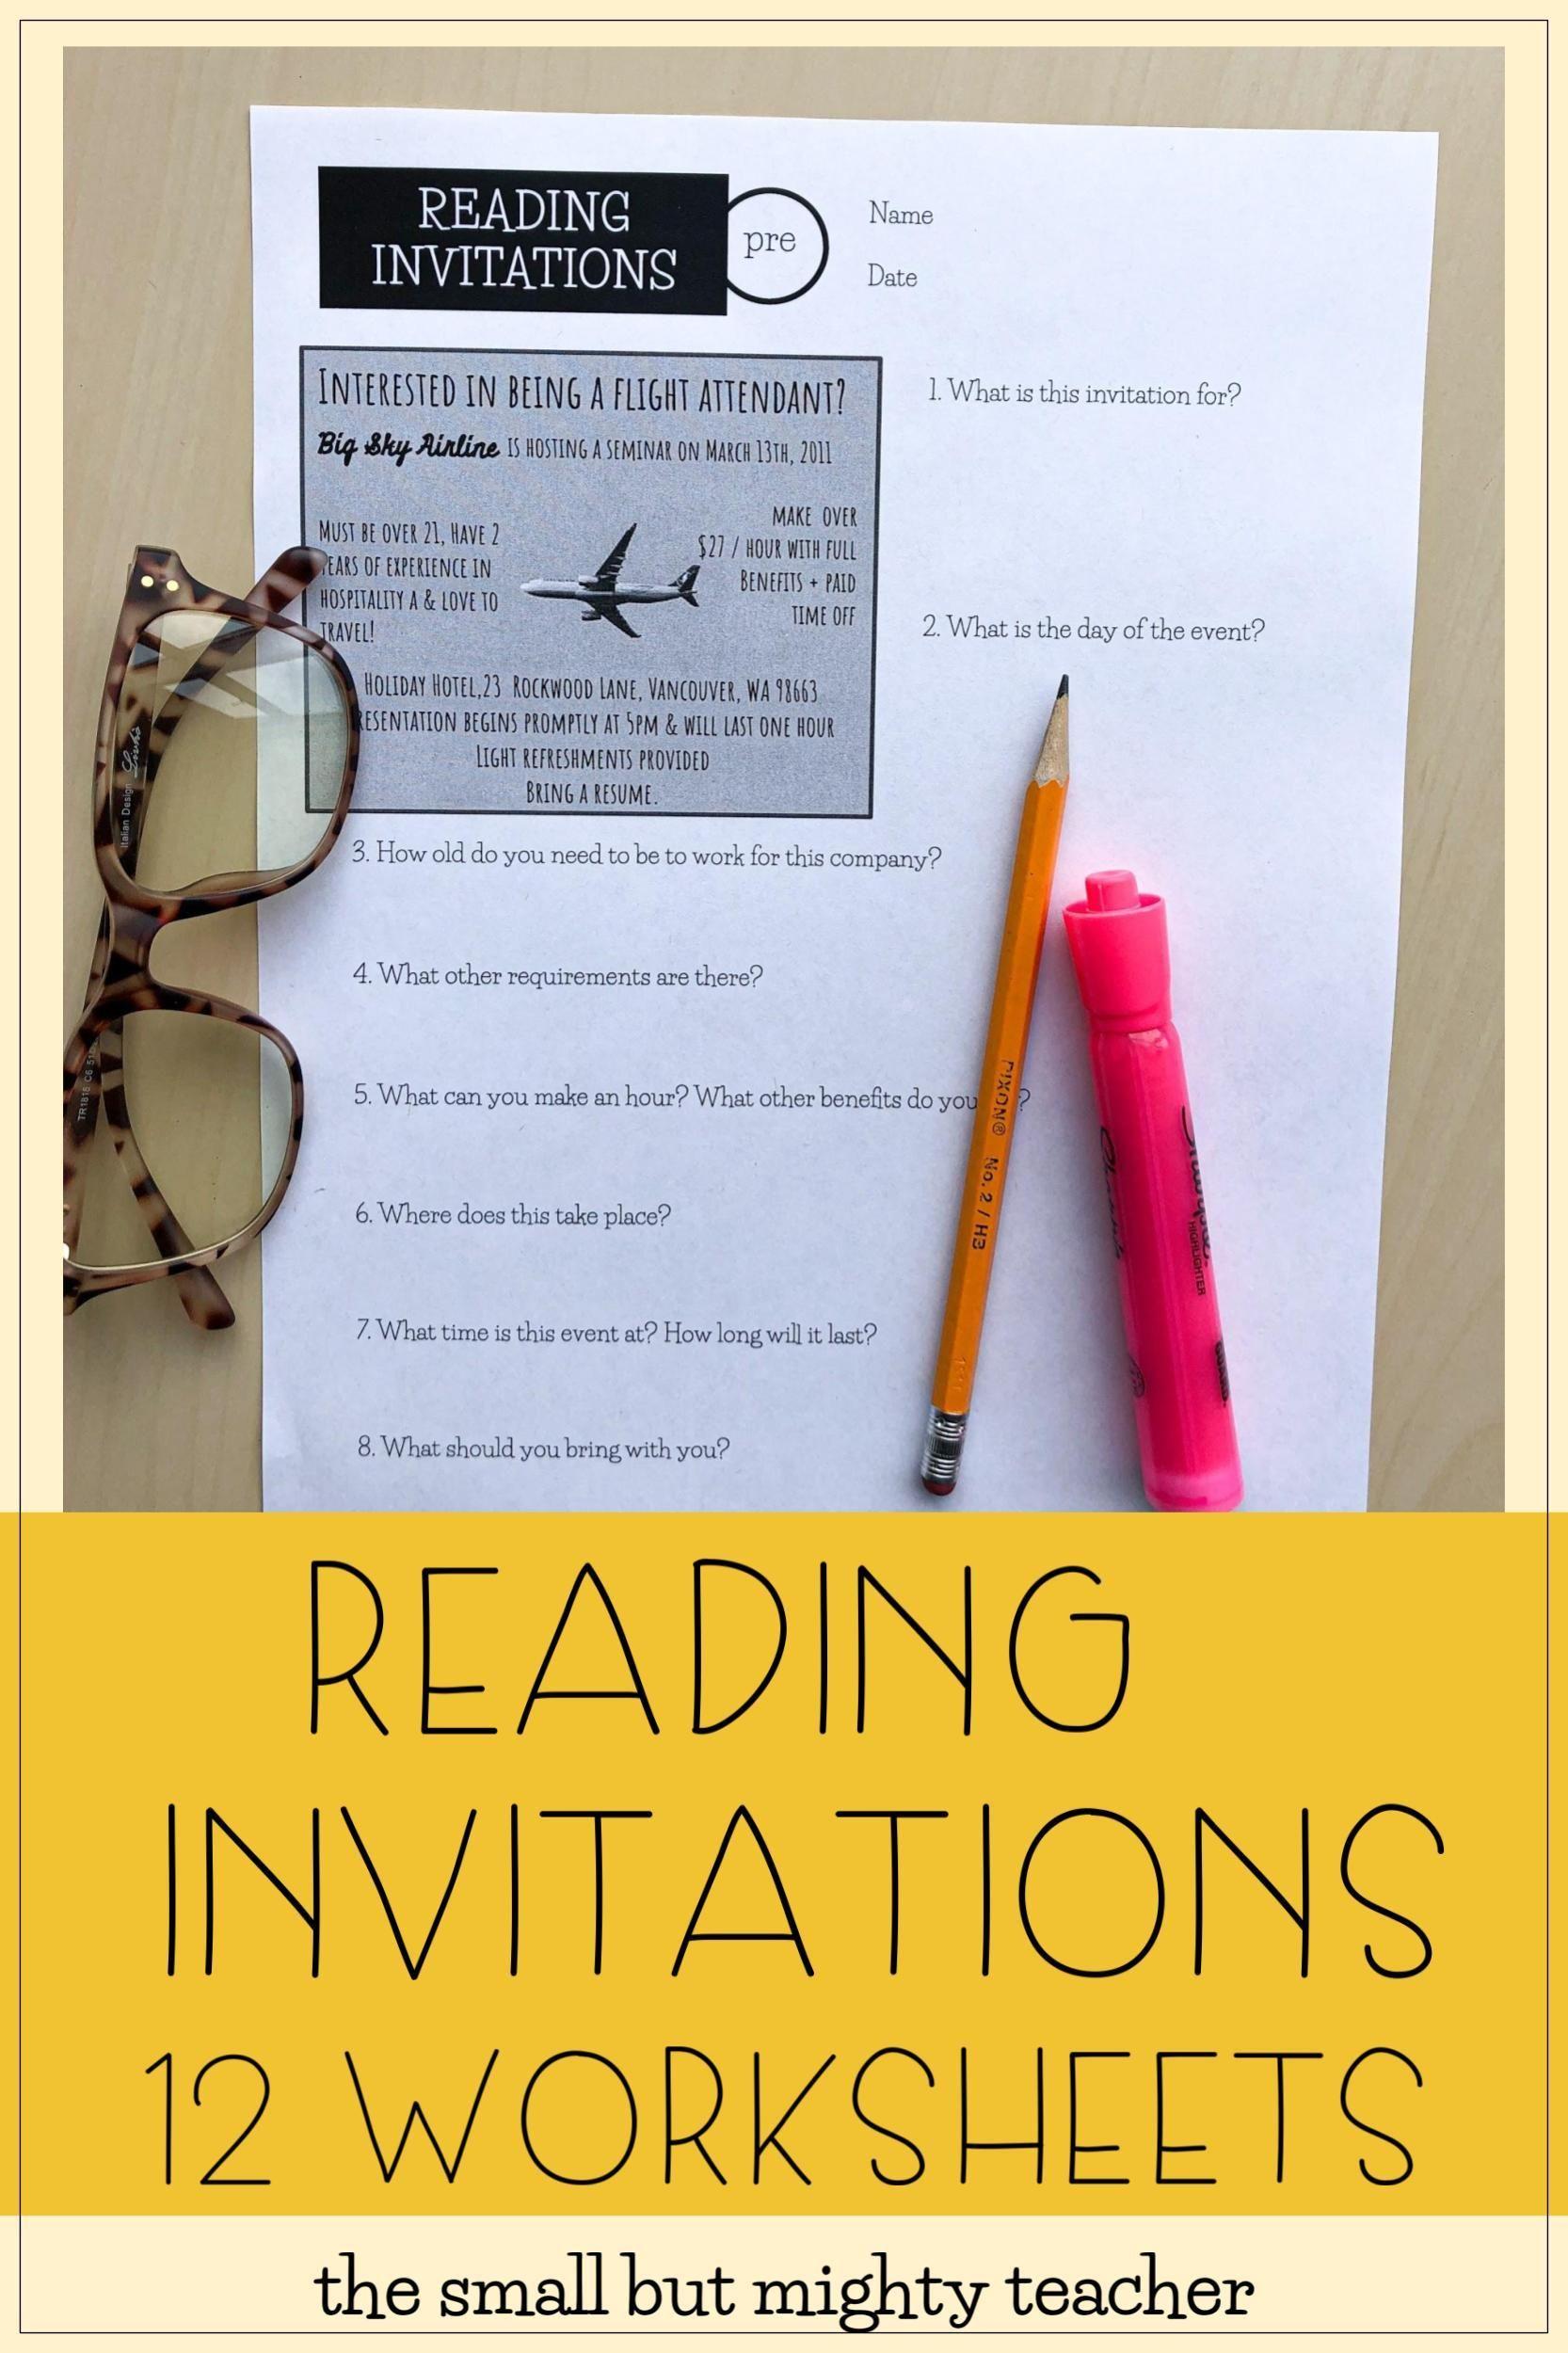 Reading Invitations Worksheets